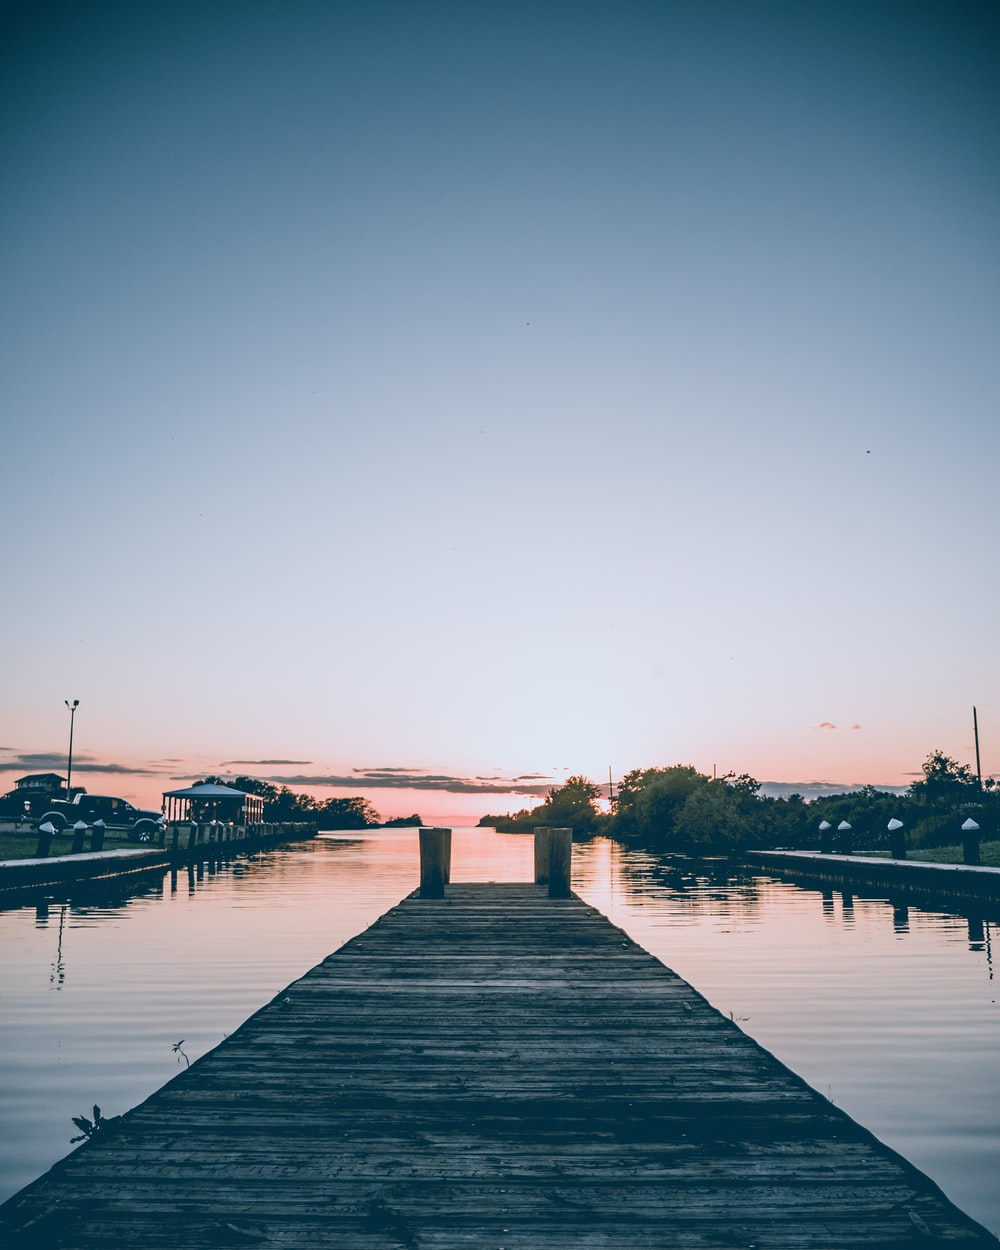 gray wooden dock under blue sky